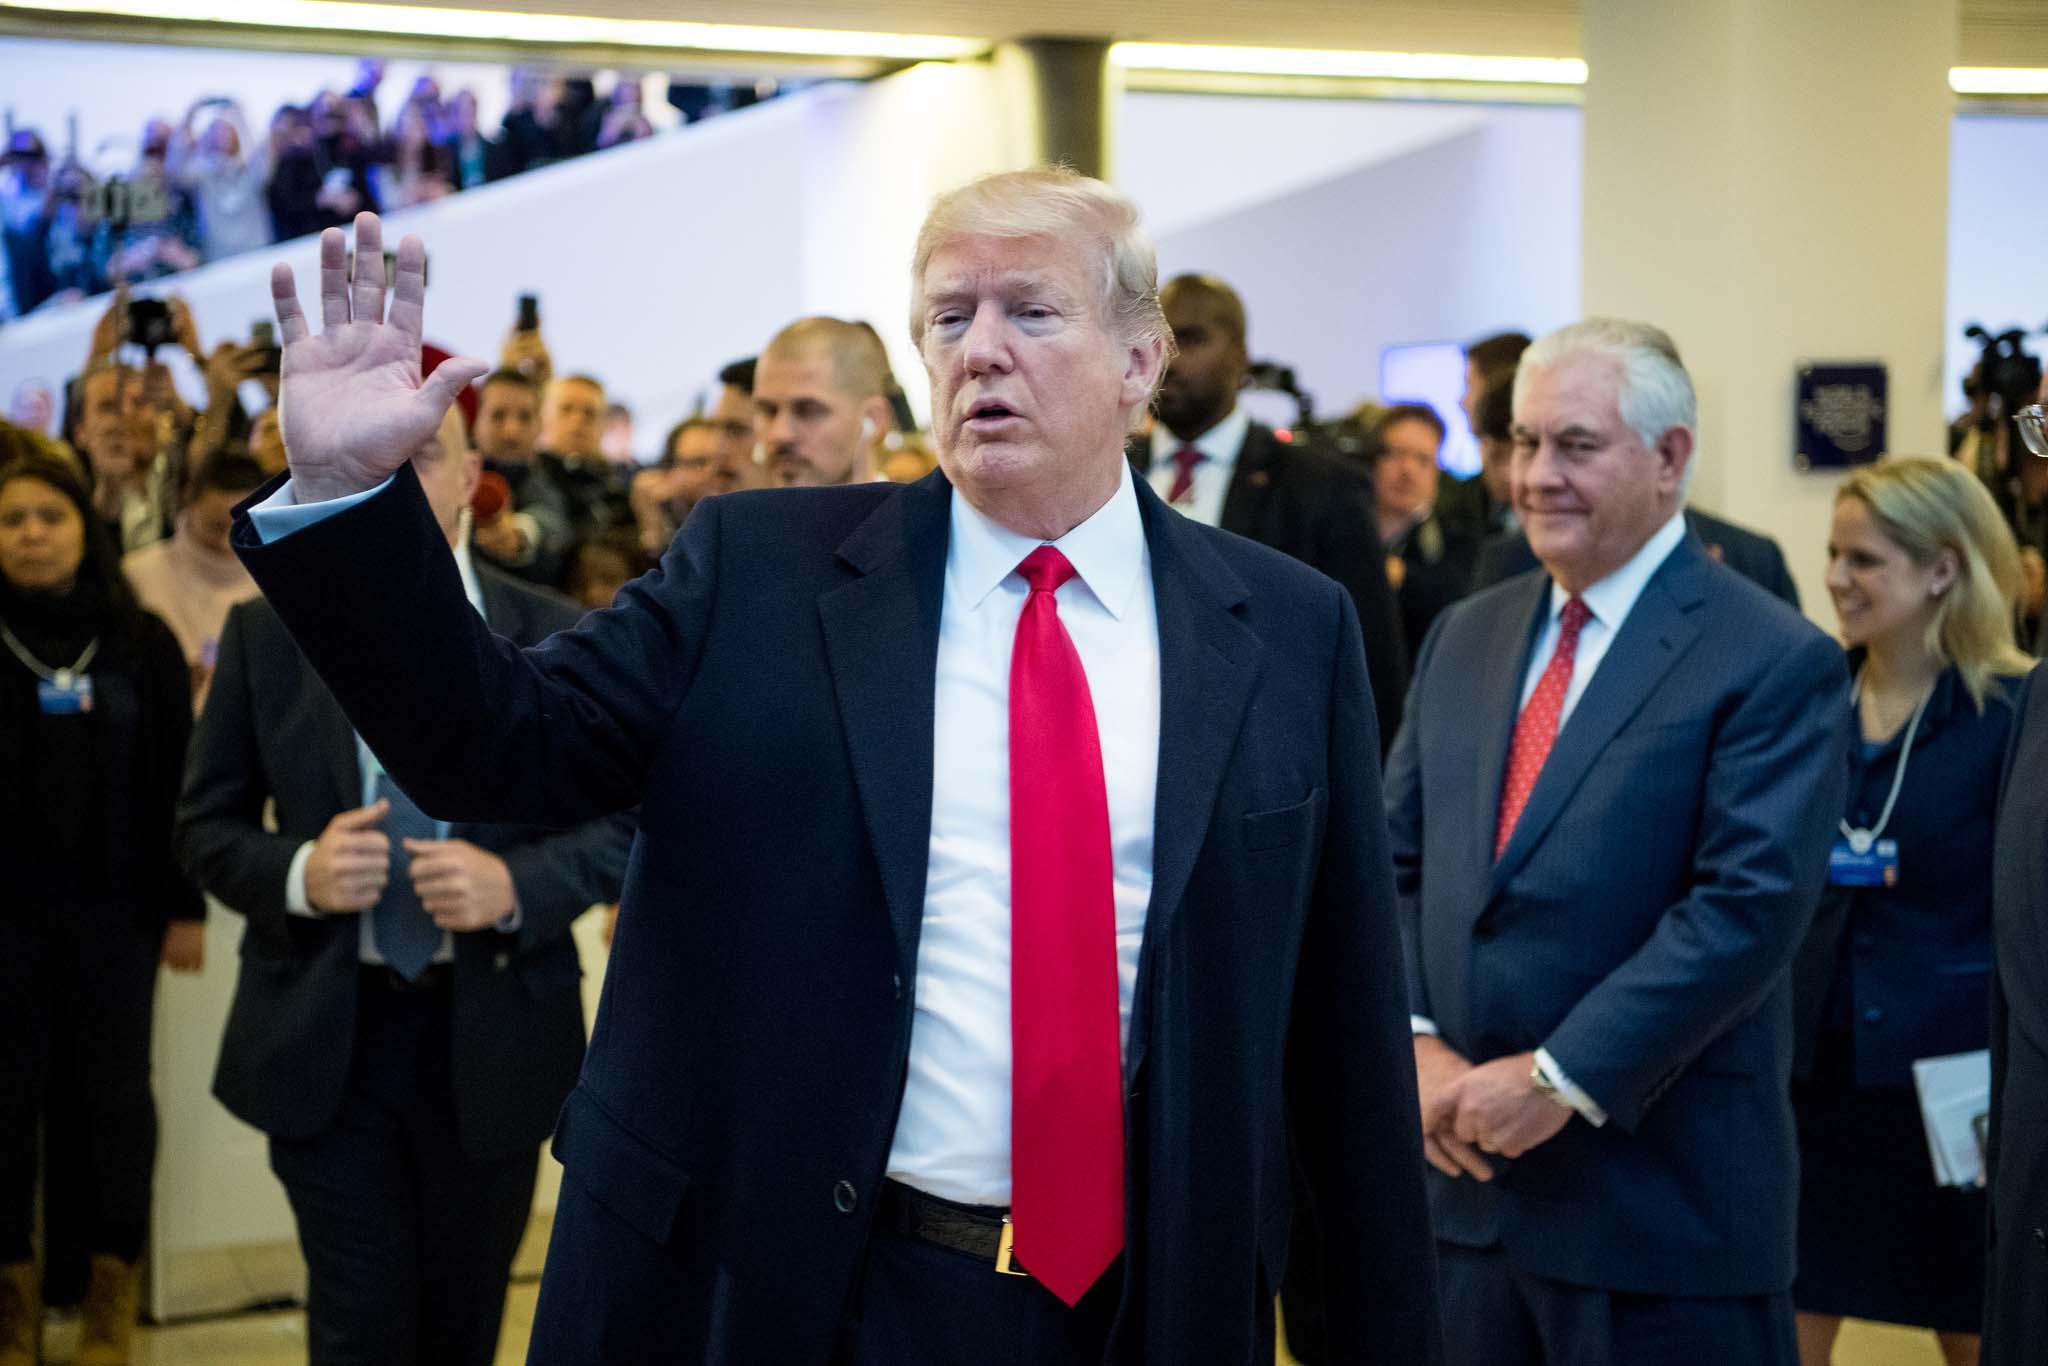 Trump promete proteção se Kim desnuclearizar Coreia do Norte